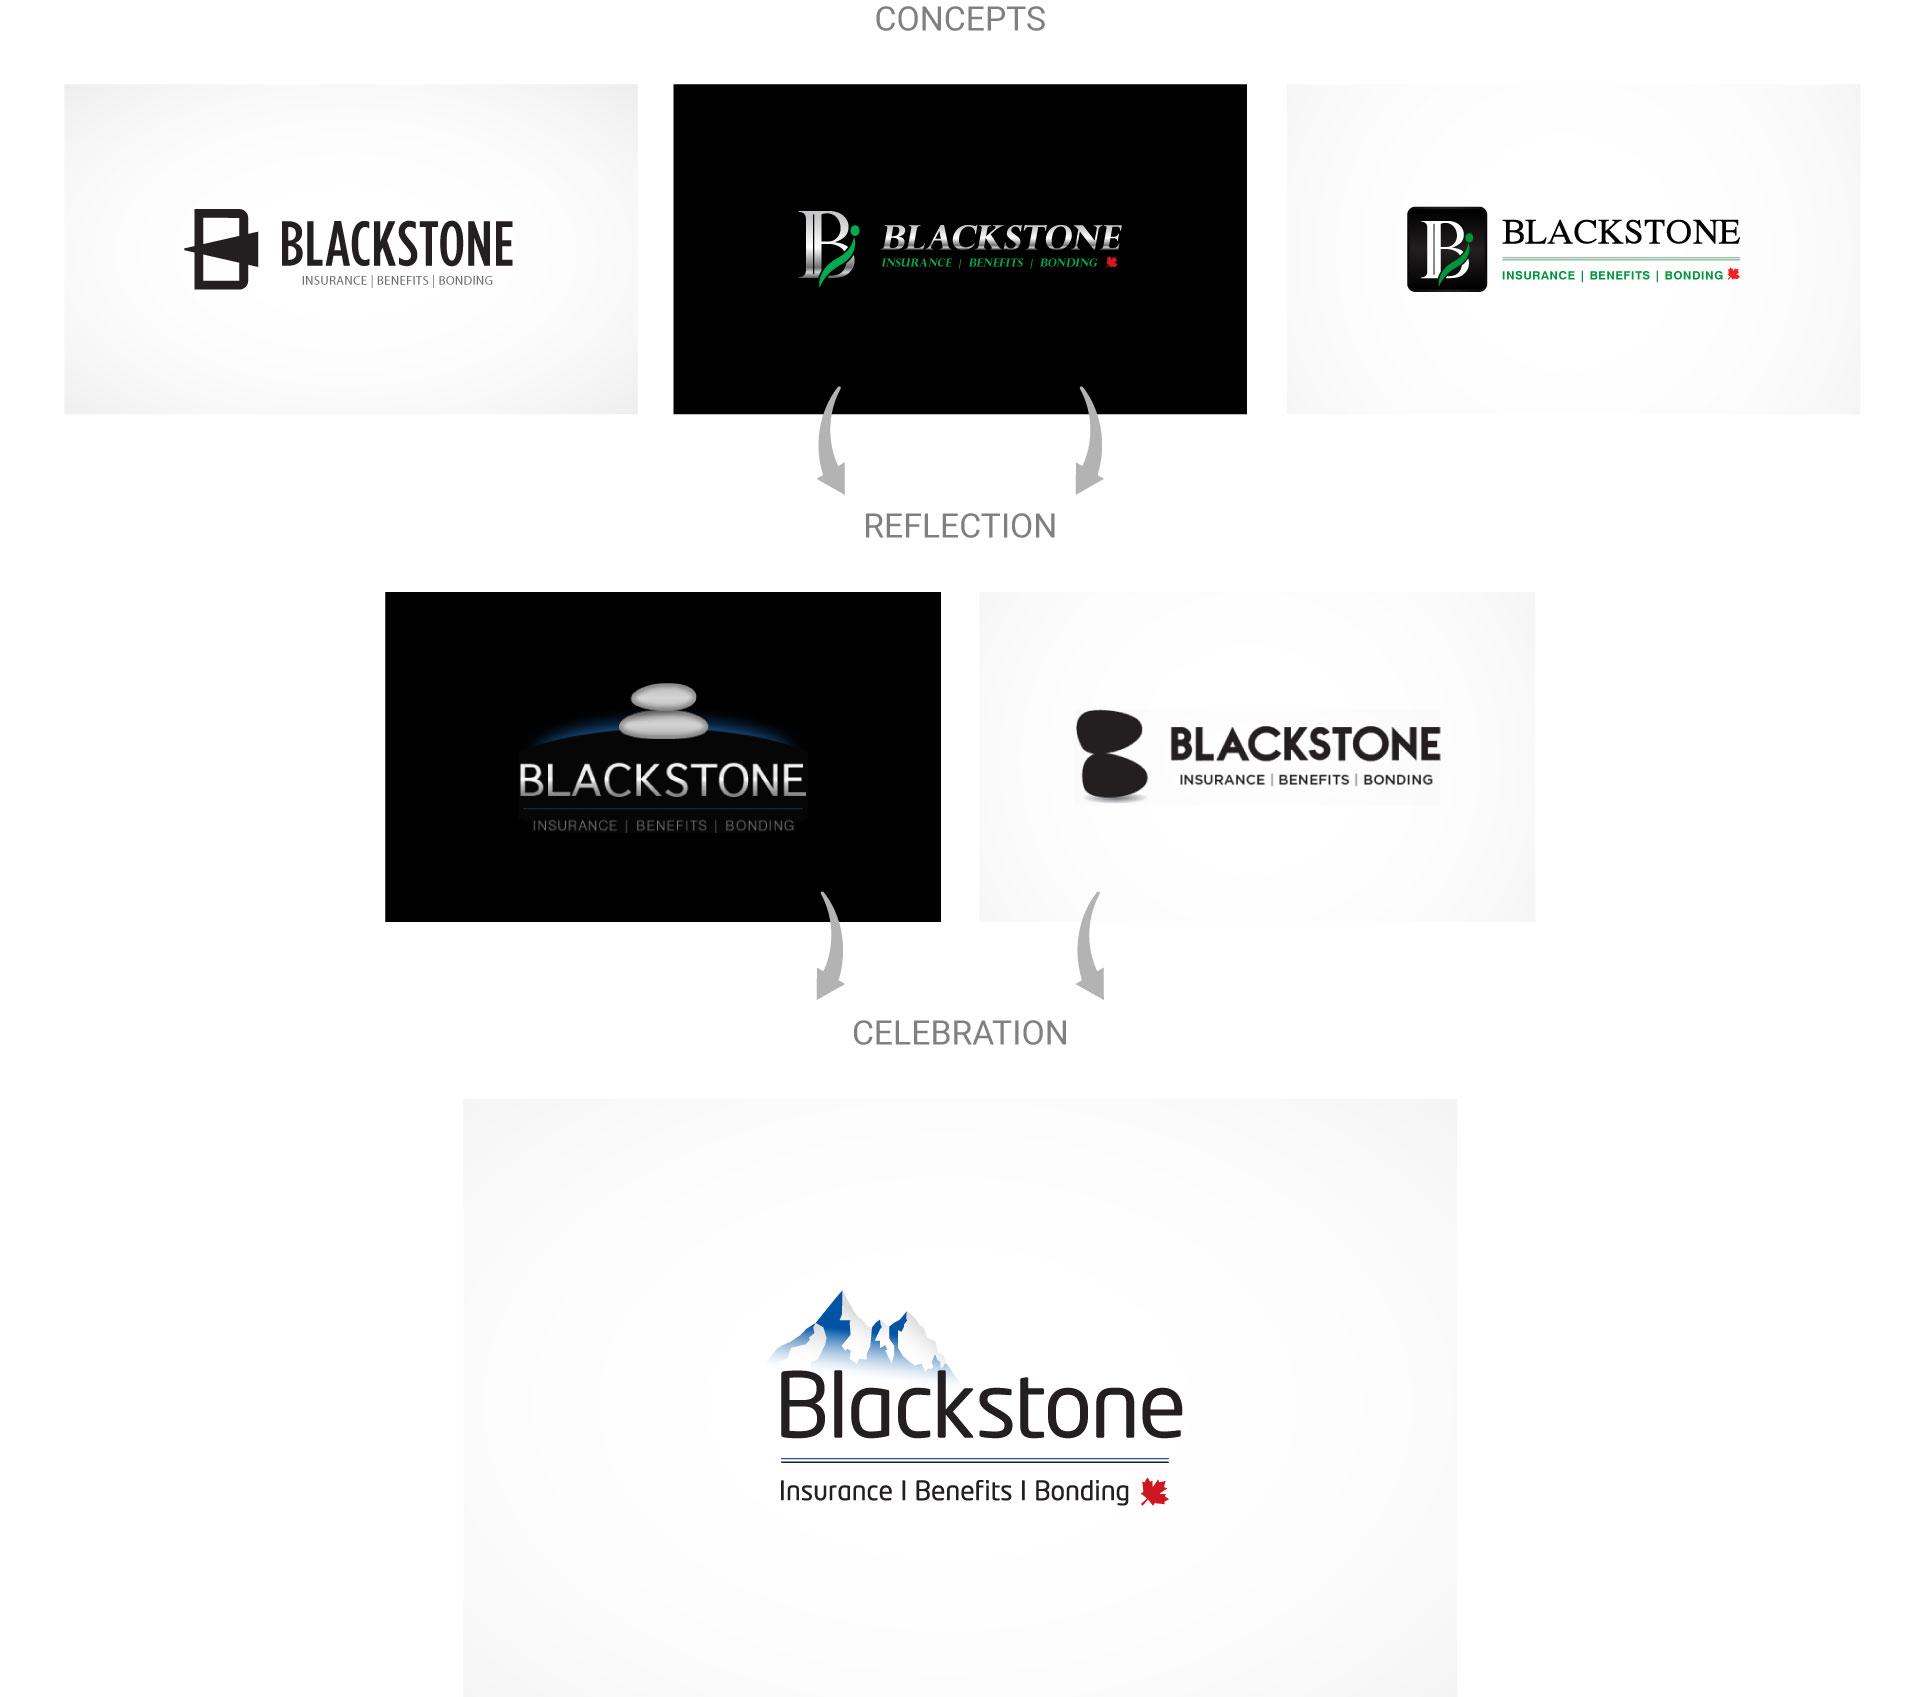 blackstone-logo-design-process-by-mapleweb-vancouver-canada